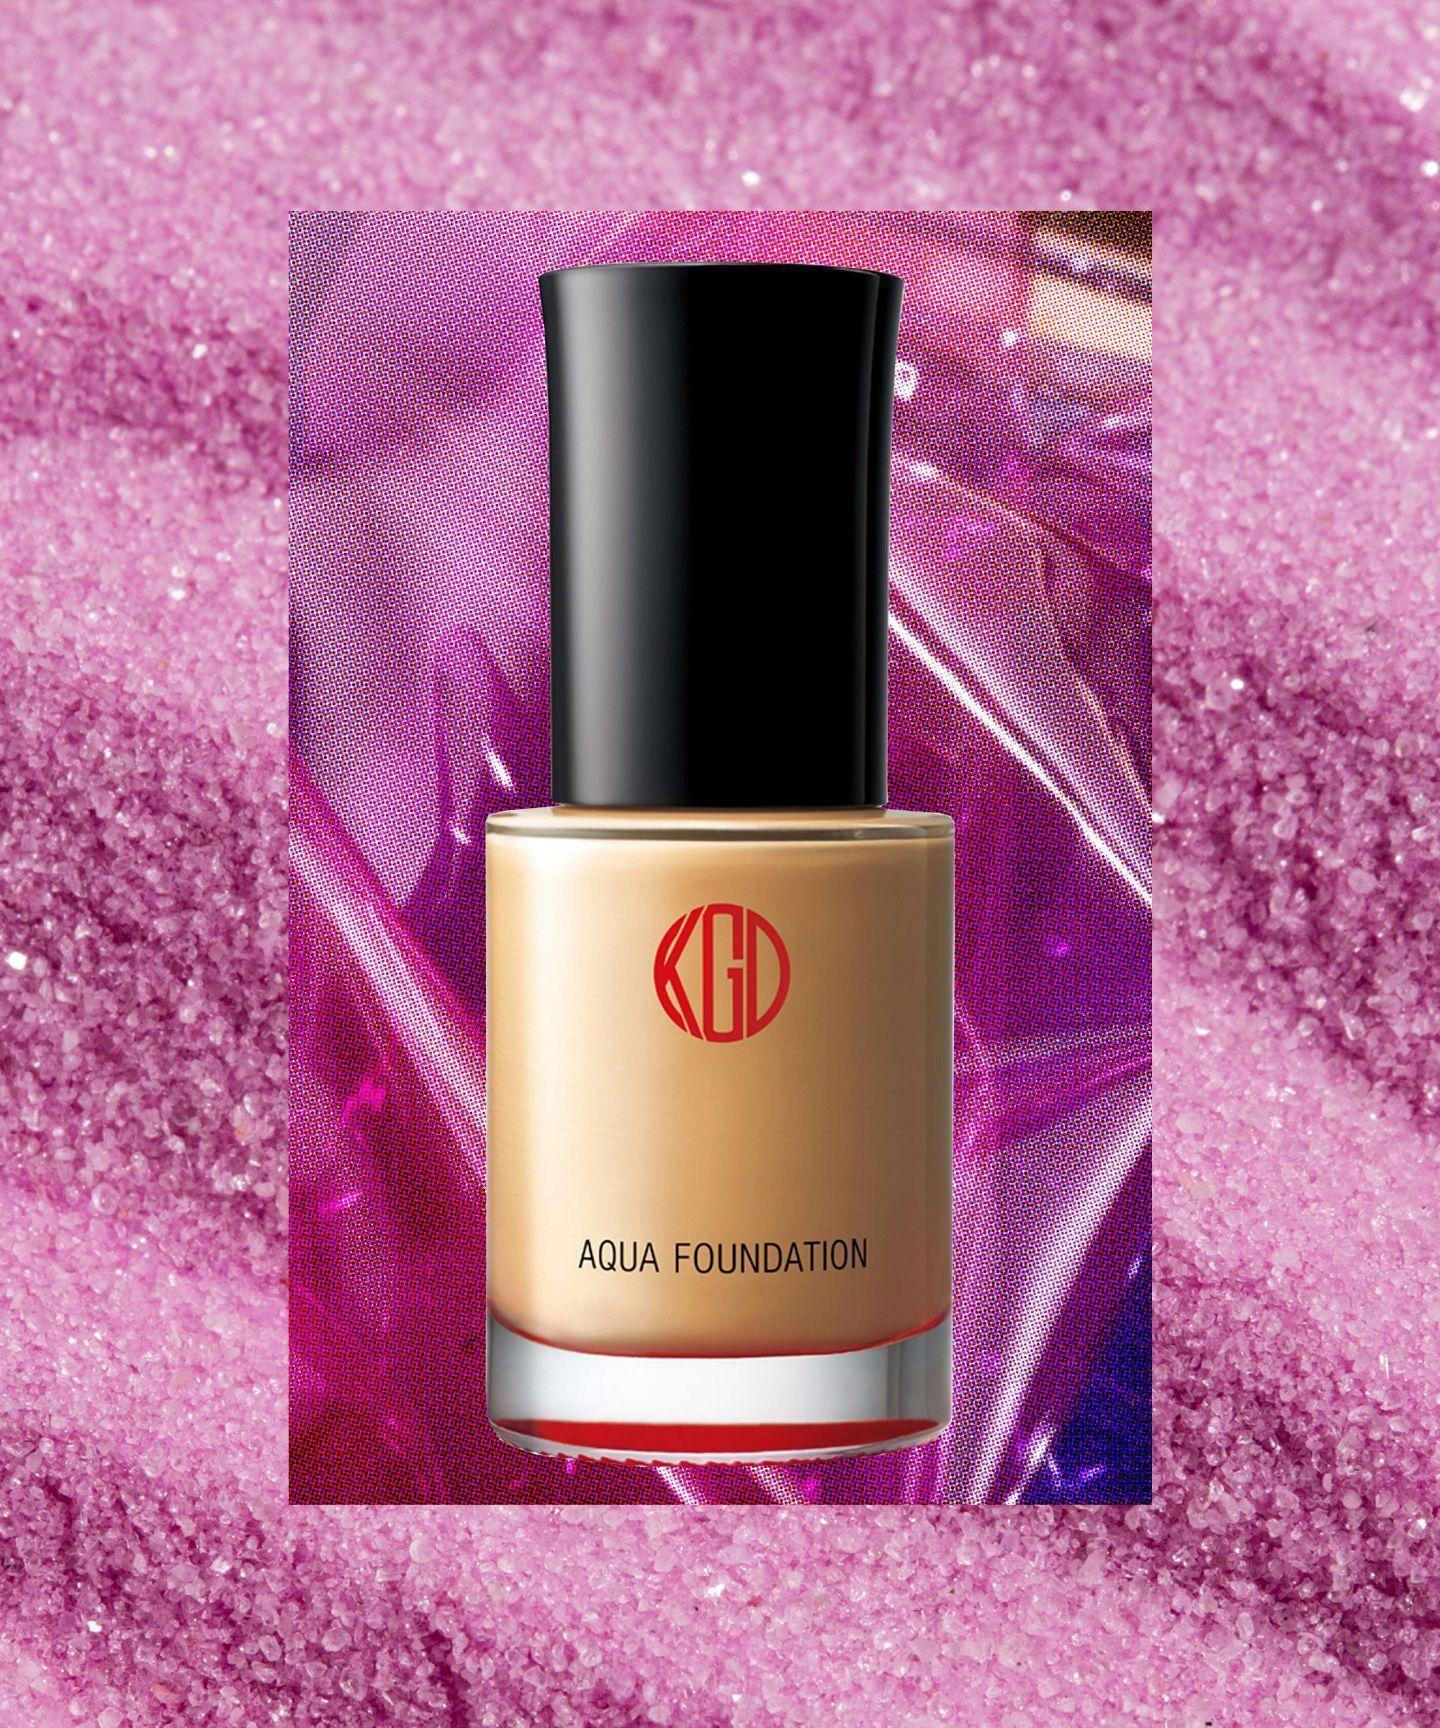 Vision Cover Cream W06 Foundation for sensitive skin